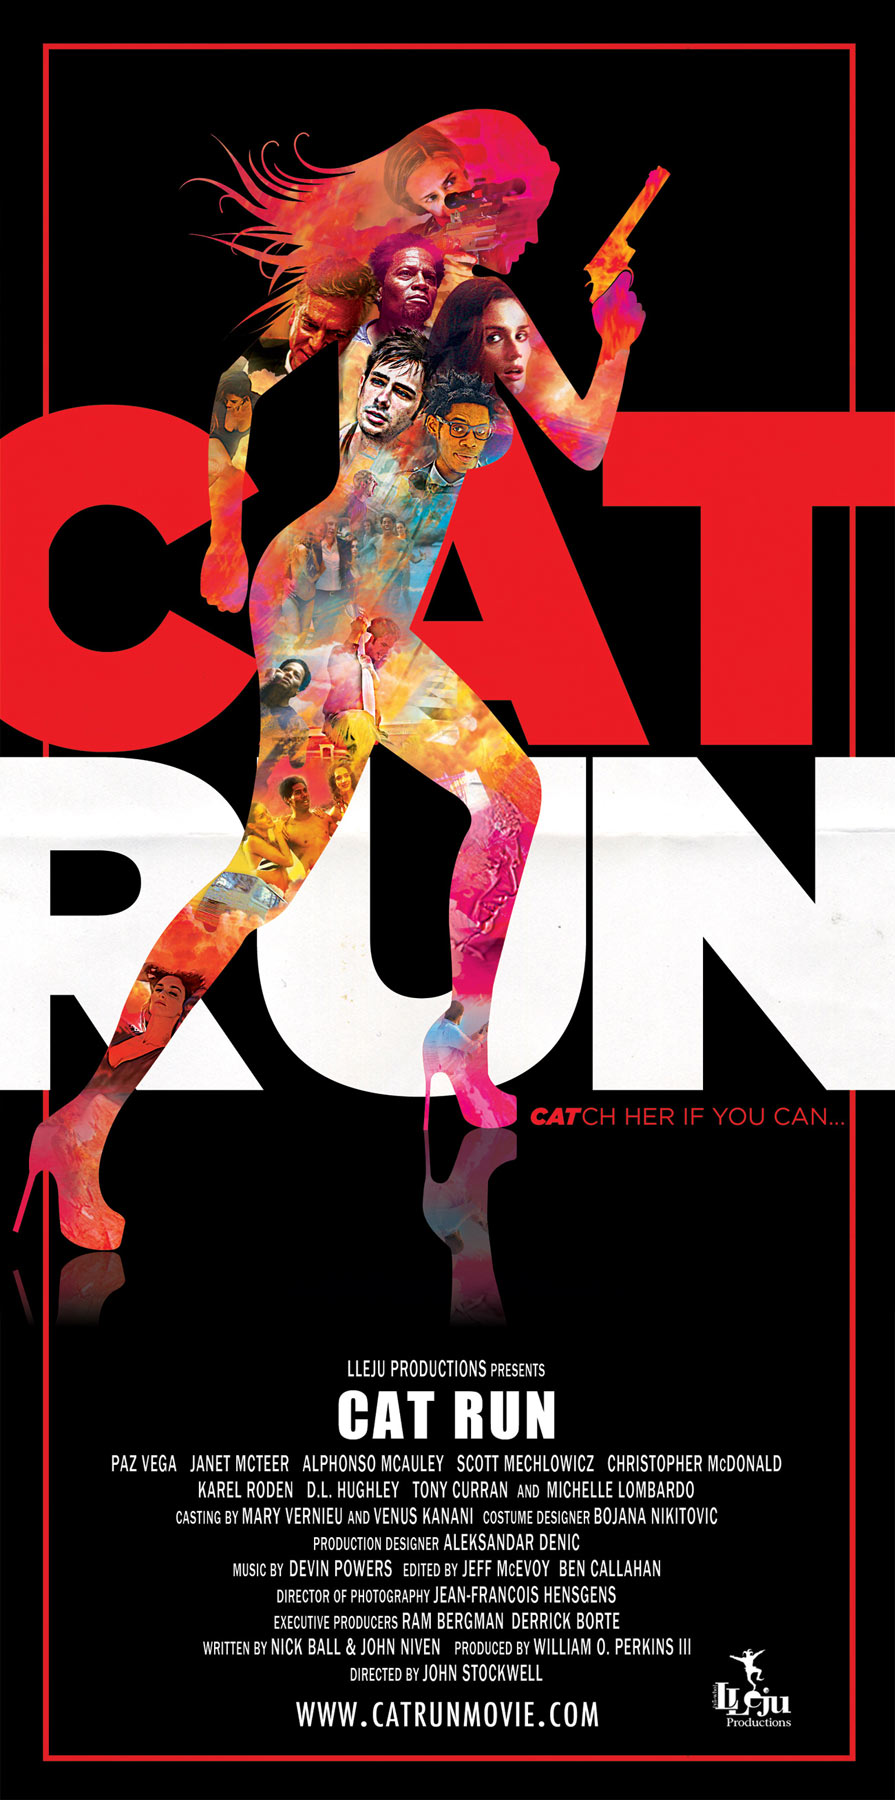 Cat Run movie poster detail